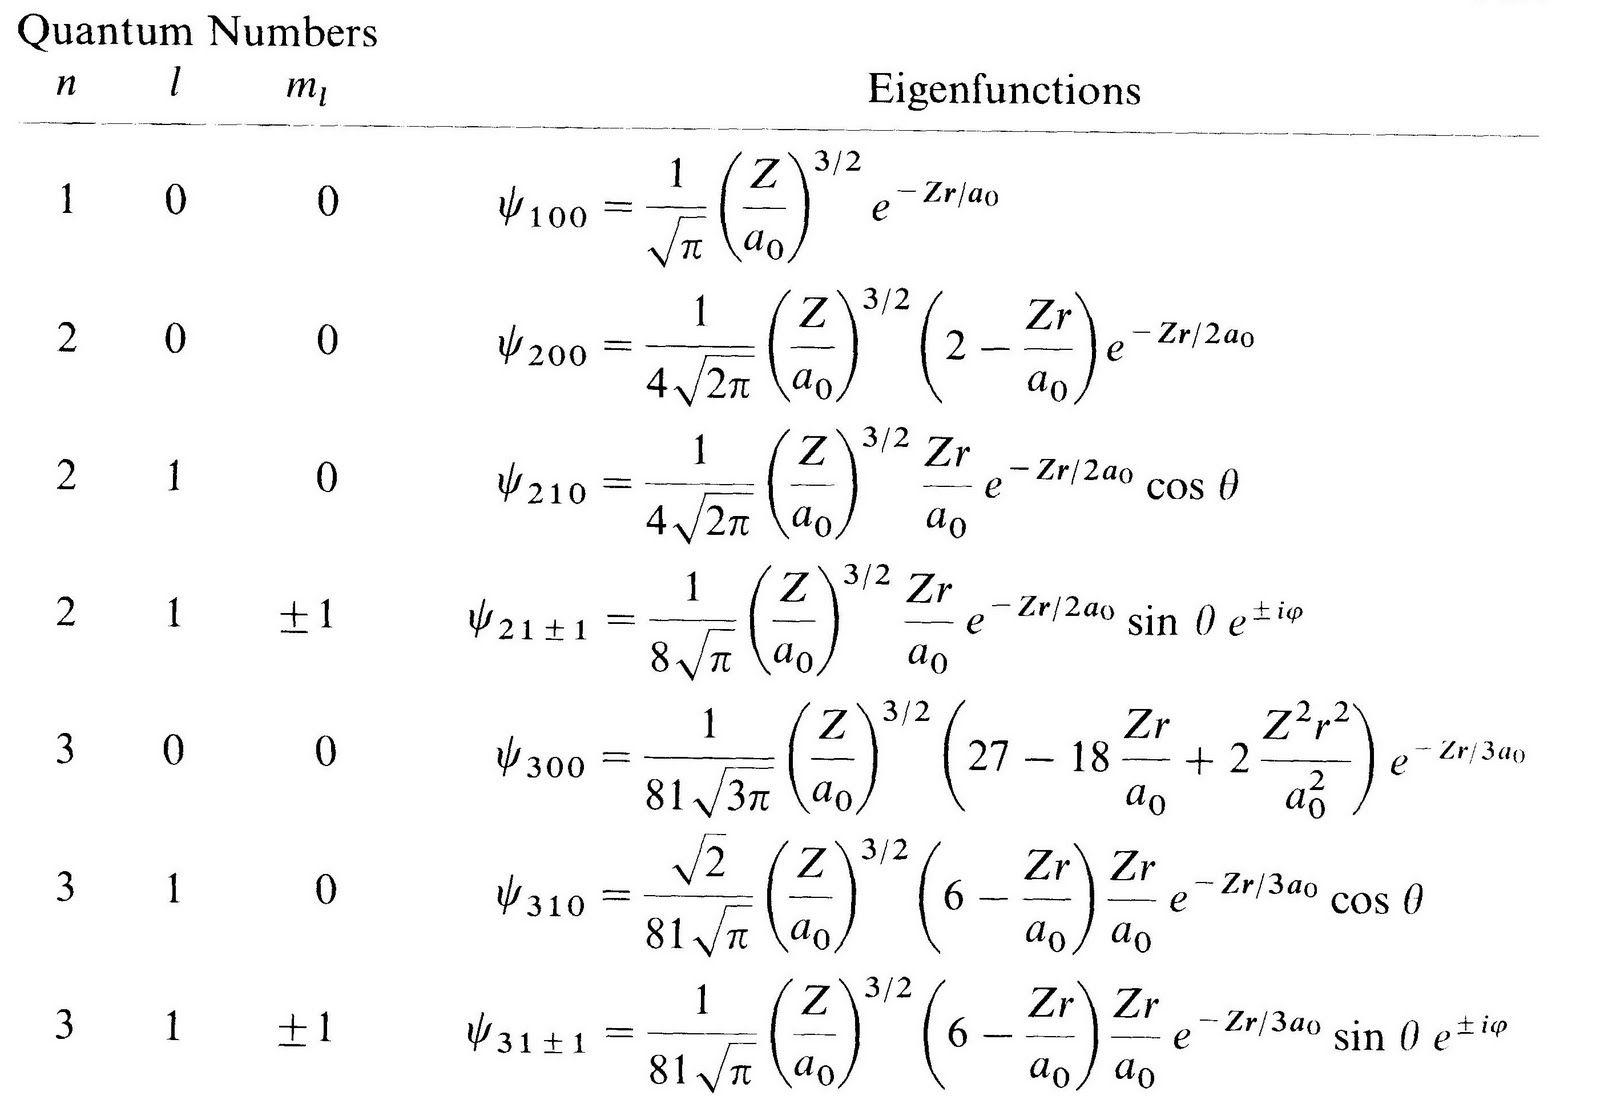 Brane Space Some More Quantum Mechanics Quantum Mechanics Quantum Mechanics Equations Quantum